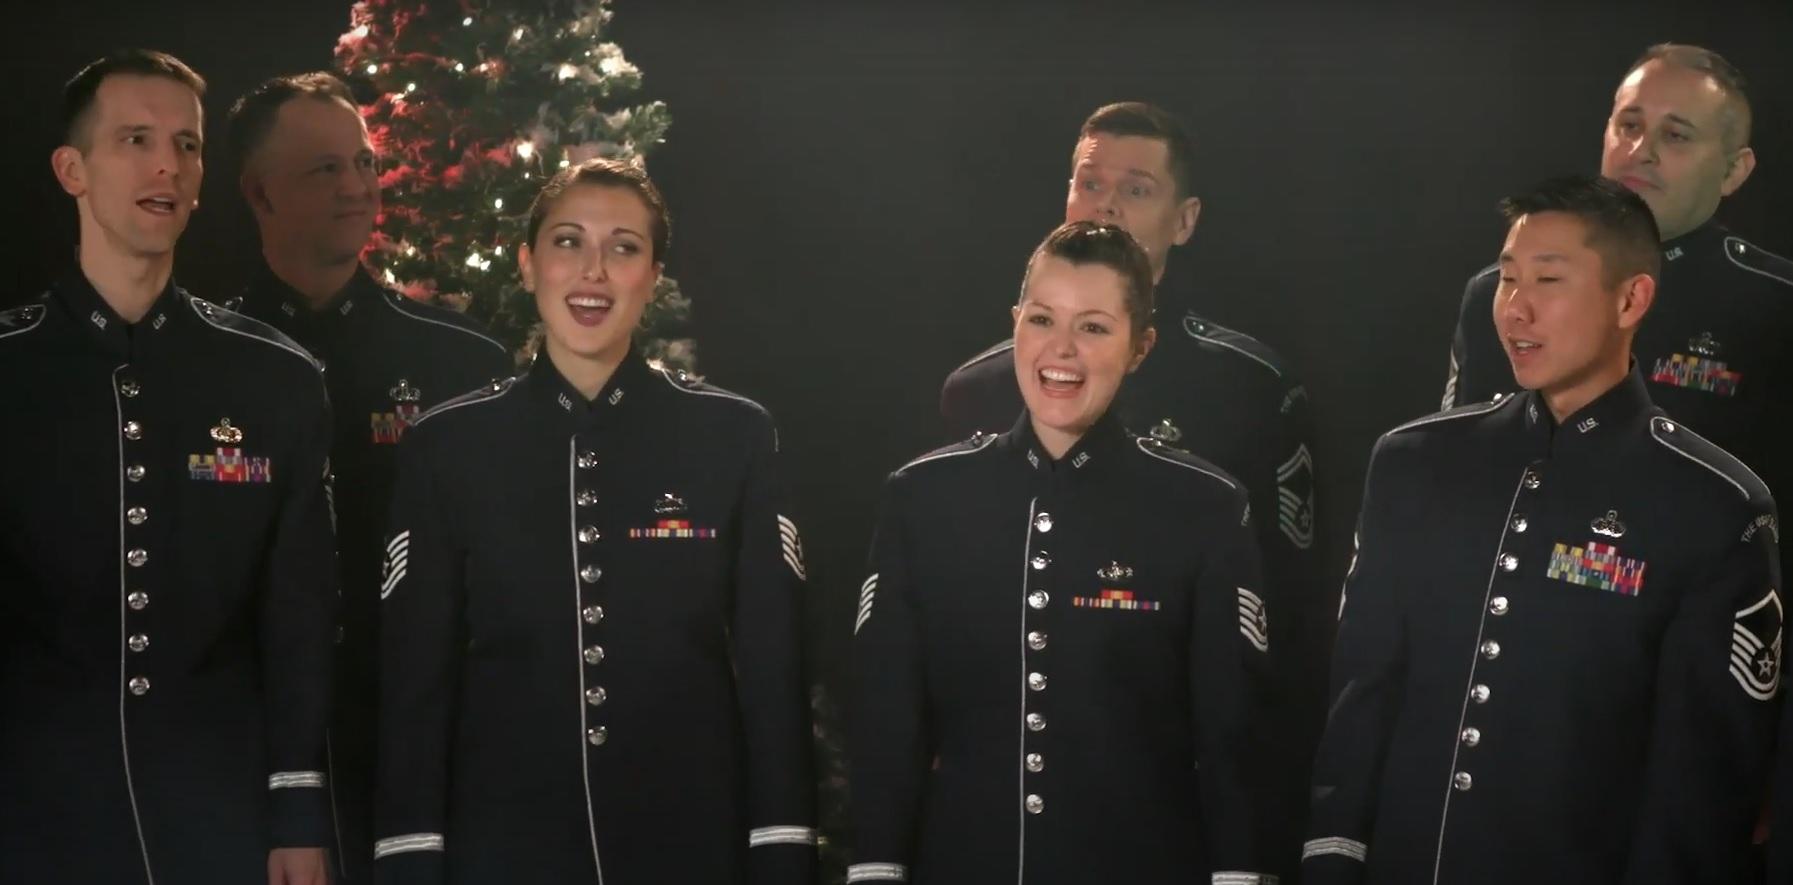 Оркестр ВПС США виконав українську колядку